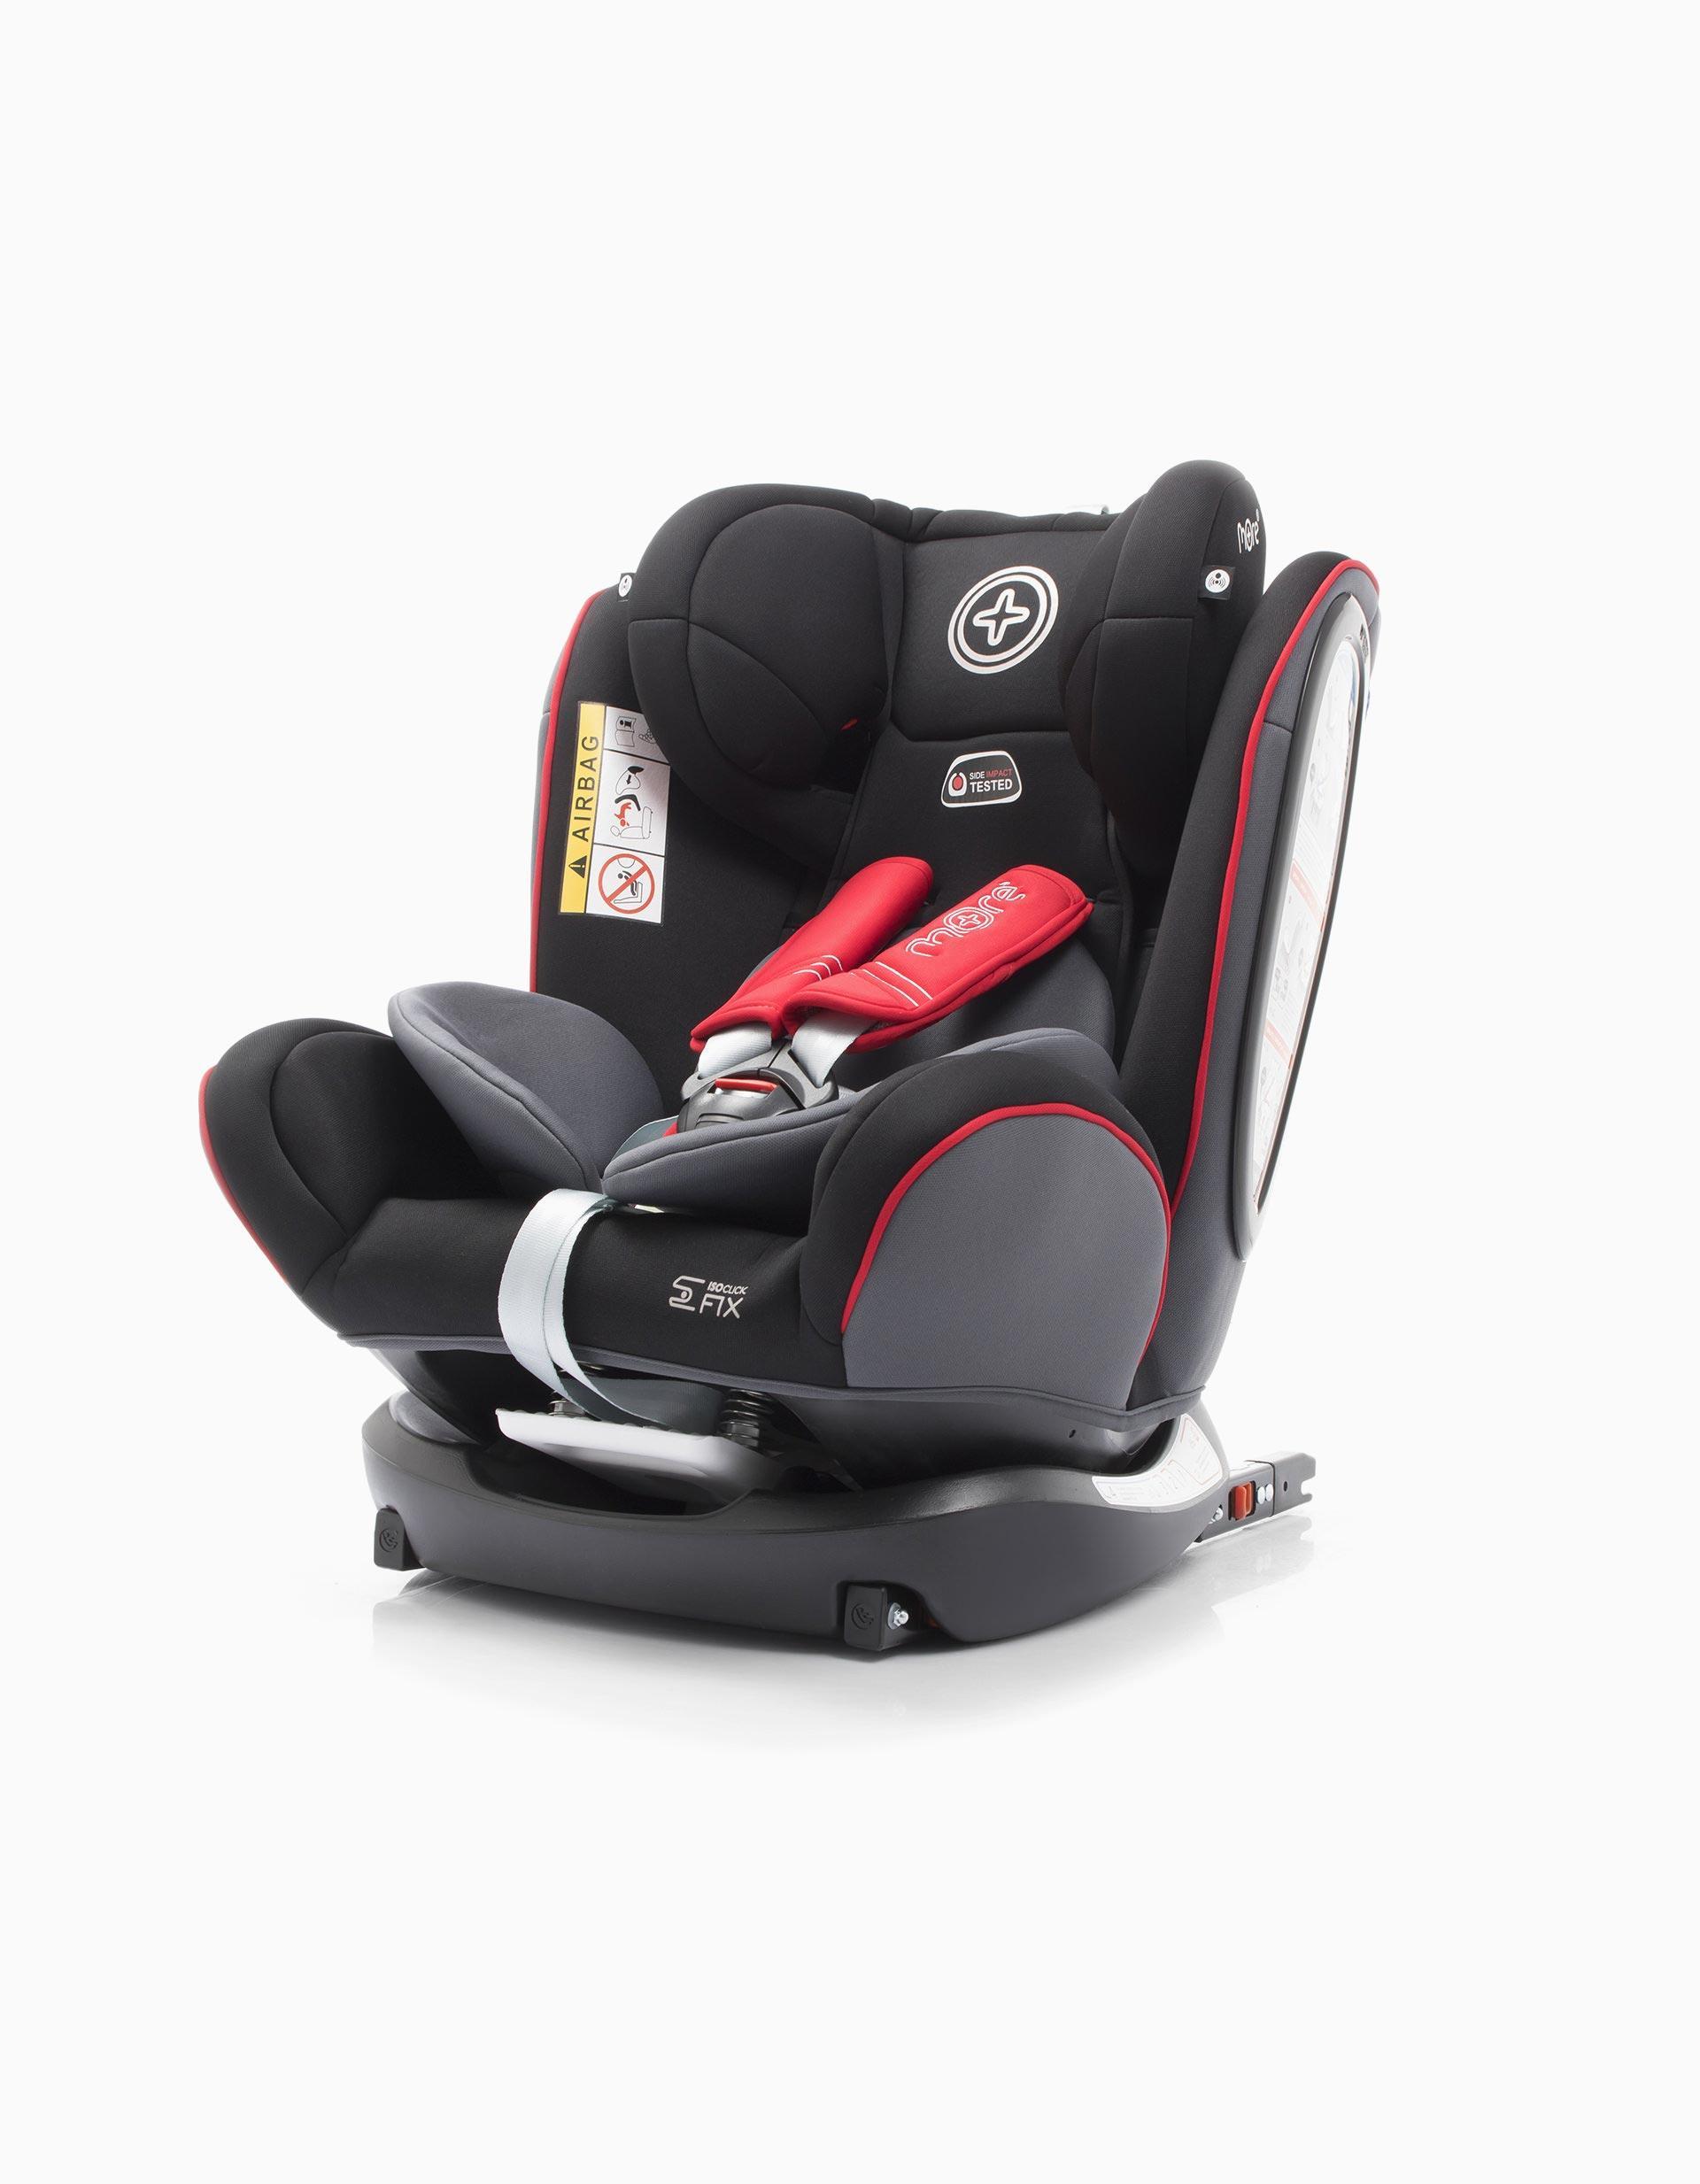 Kindersitz Babyauto 8436015311718 8436015311718